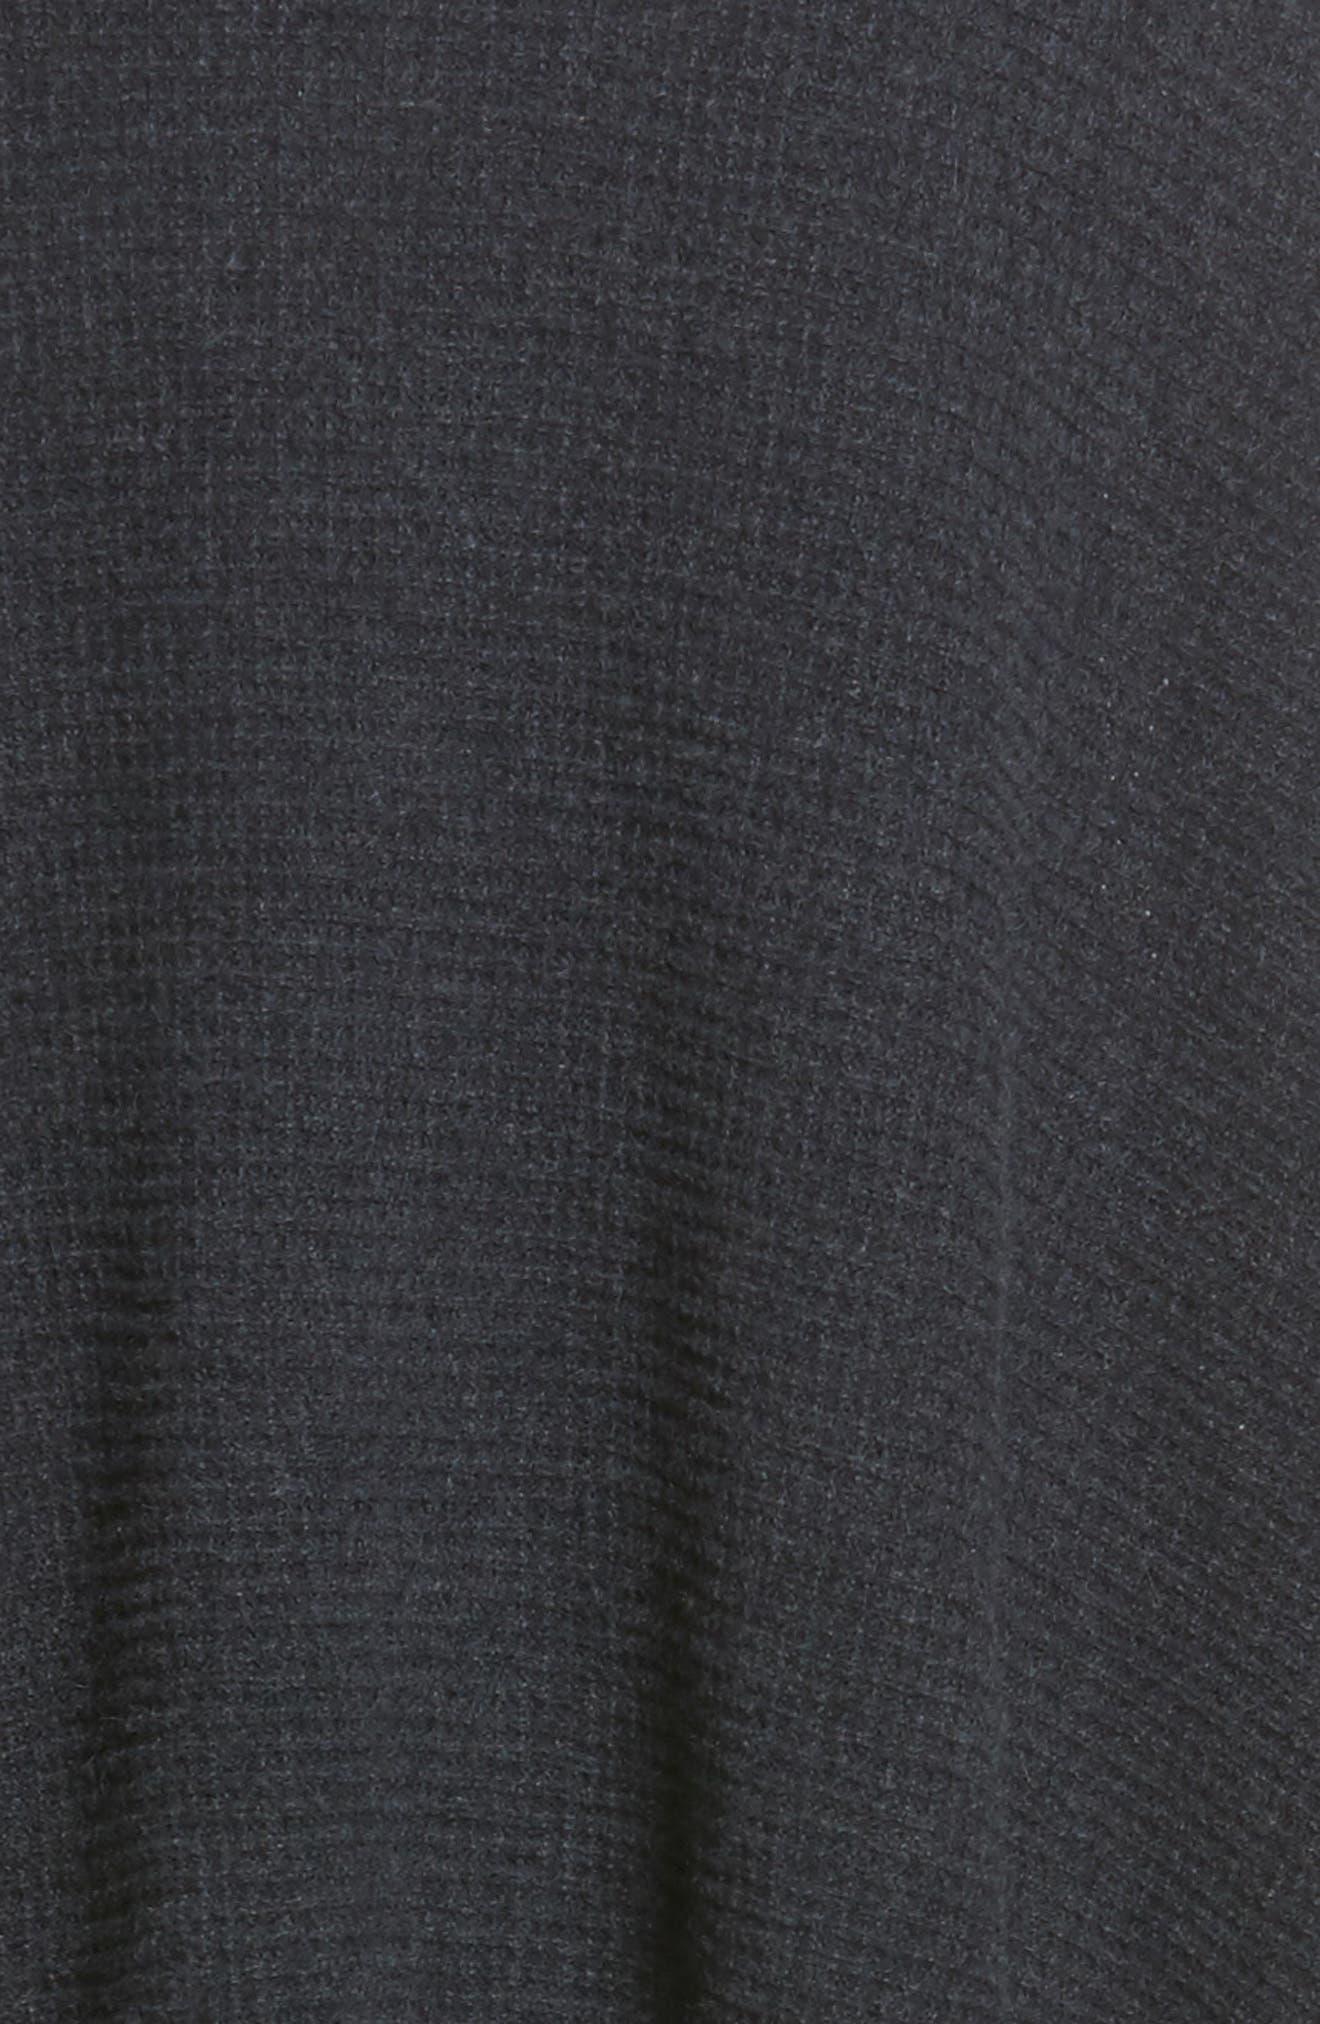 Waffle Knit Cashmere Wrap,                             Alternate thumbnail 22, color,